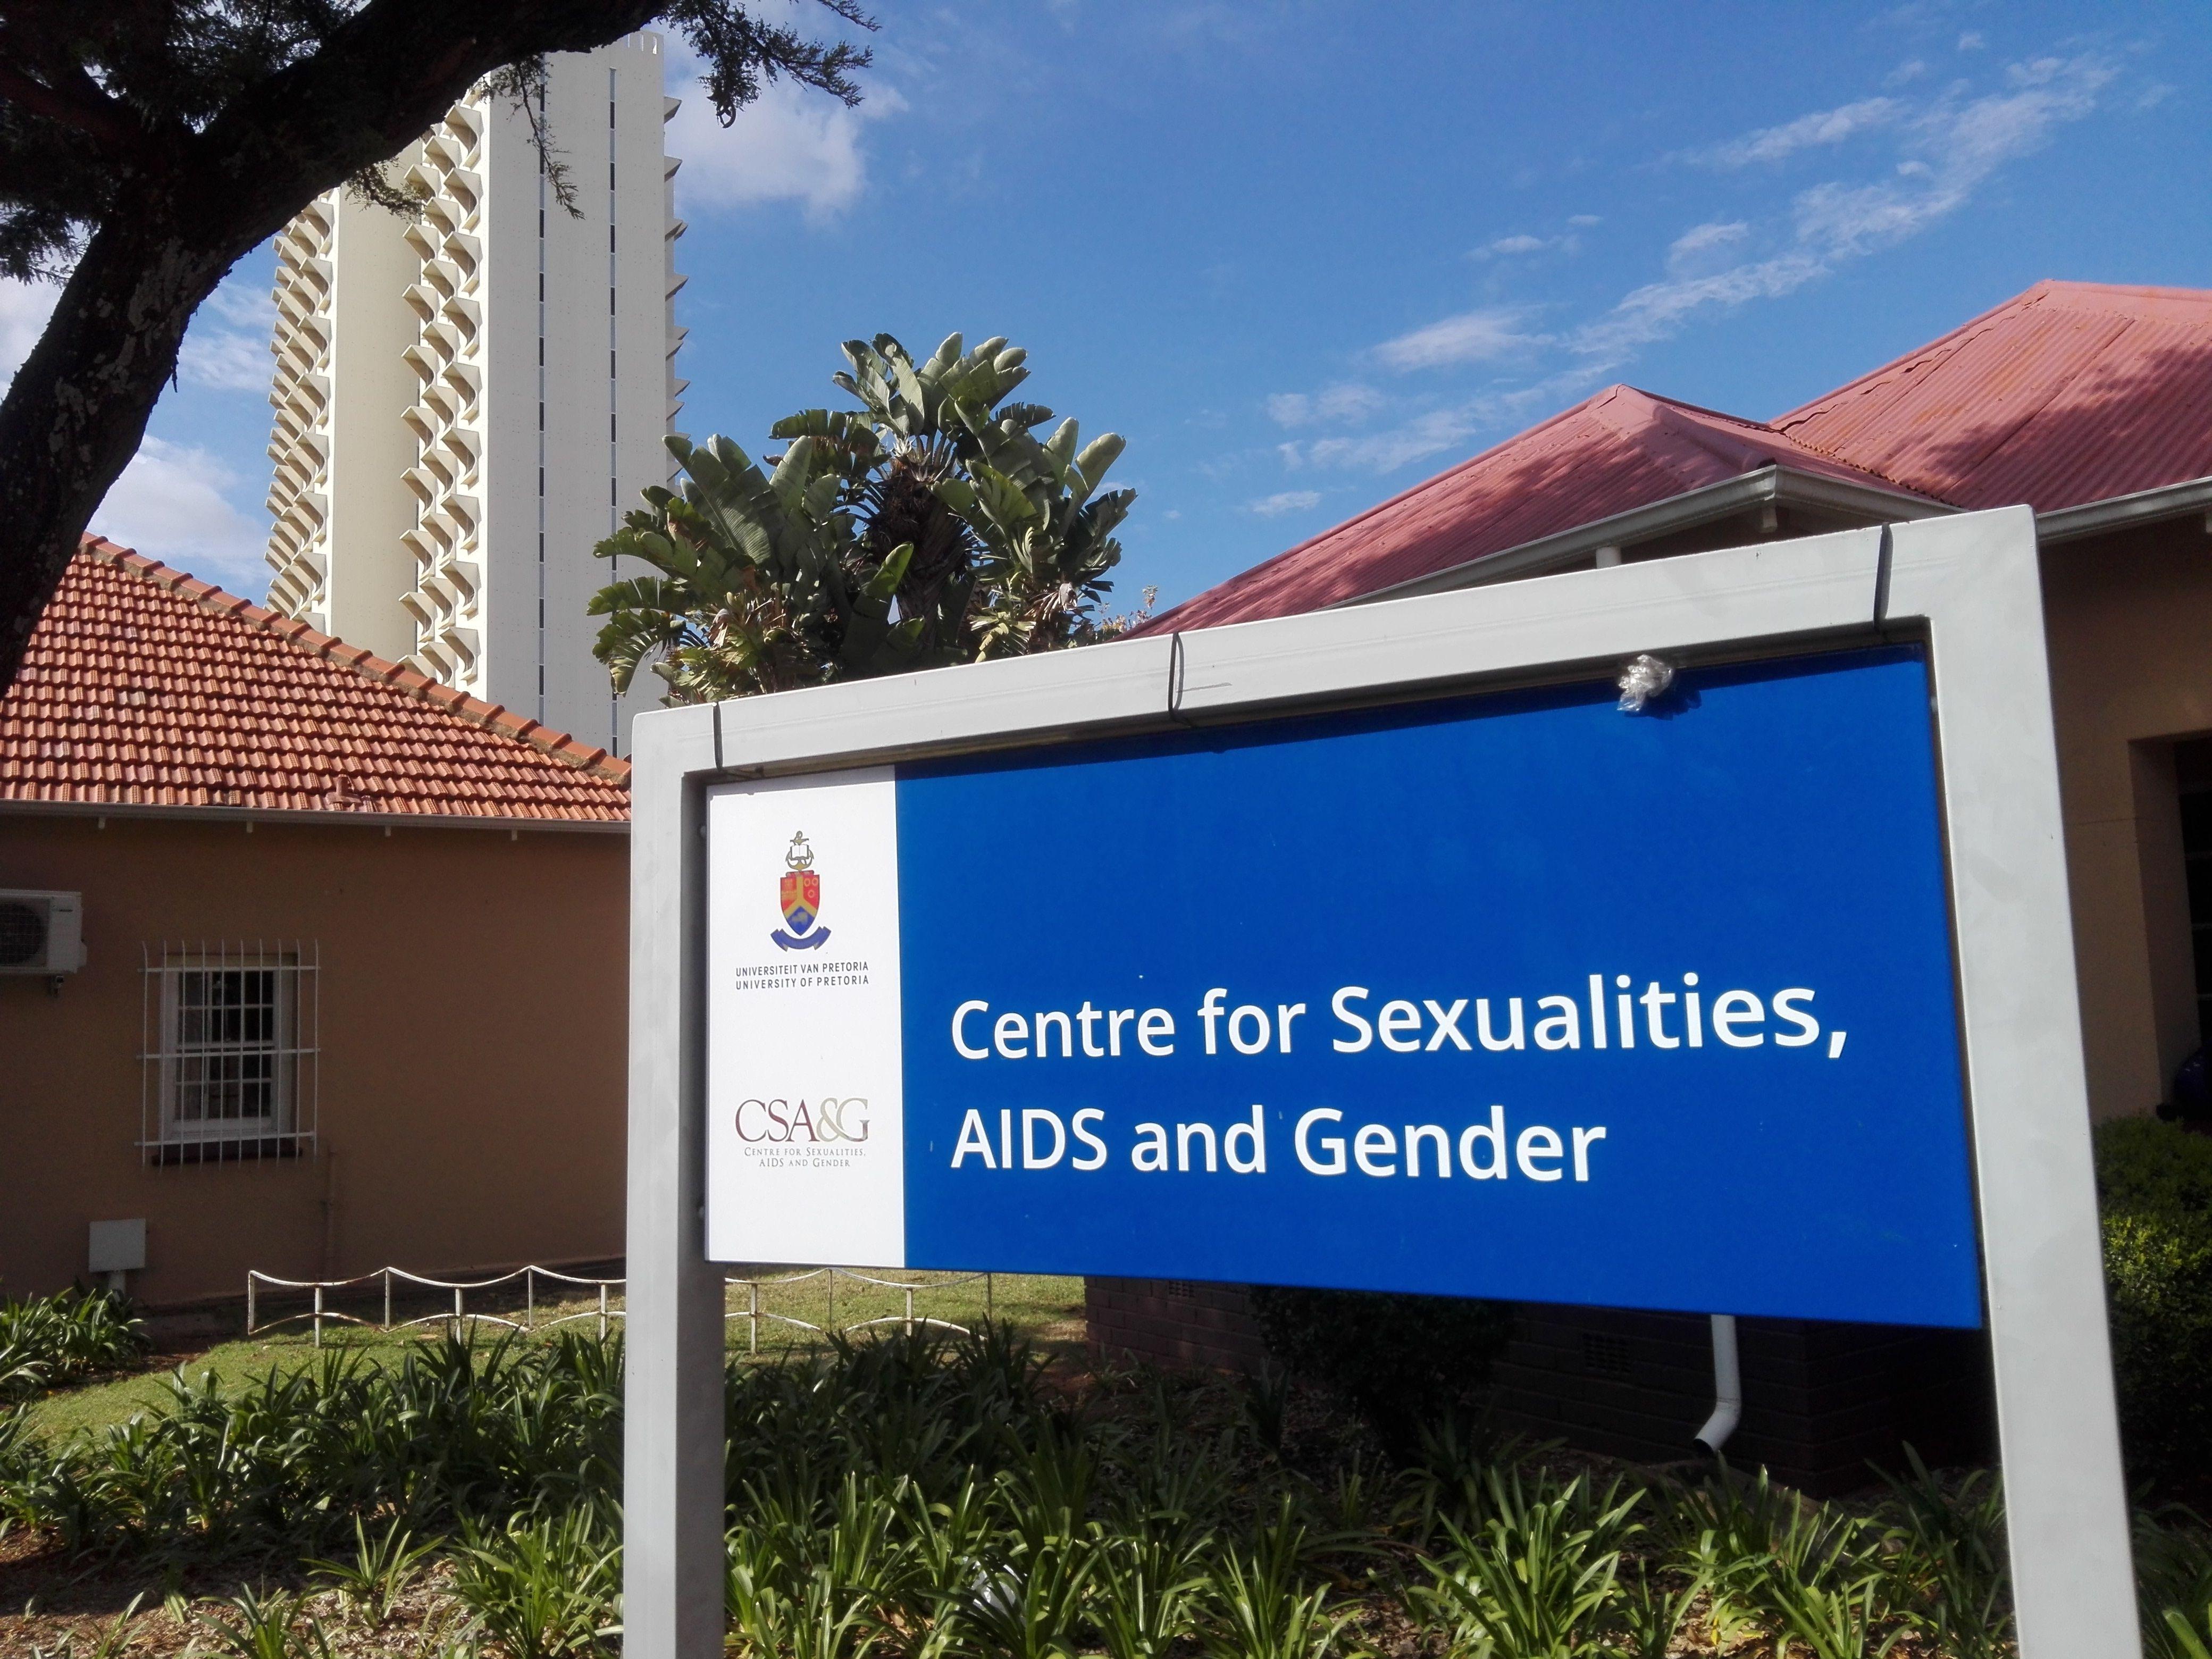 The new LGBT centre looks lit.